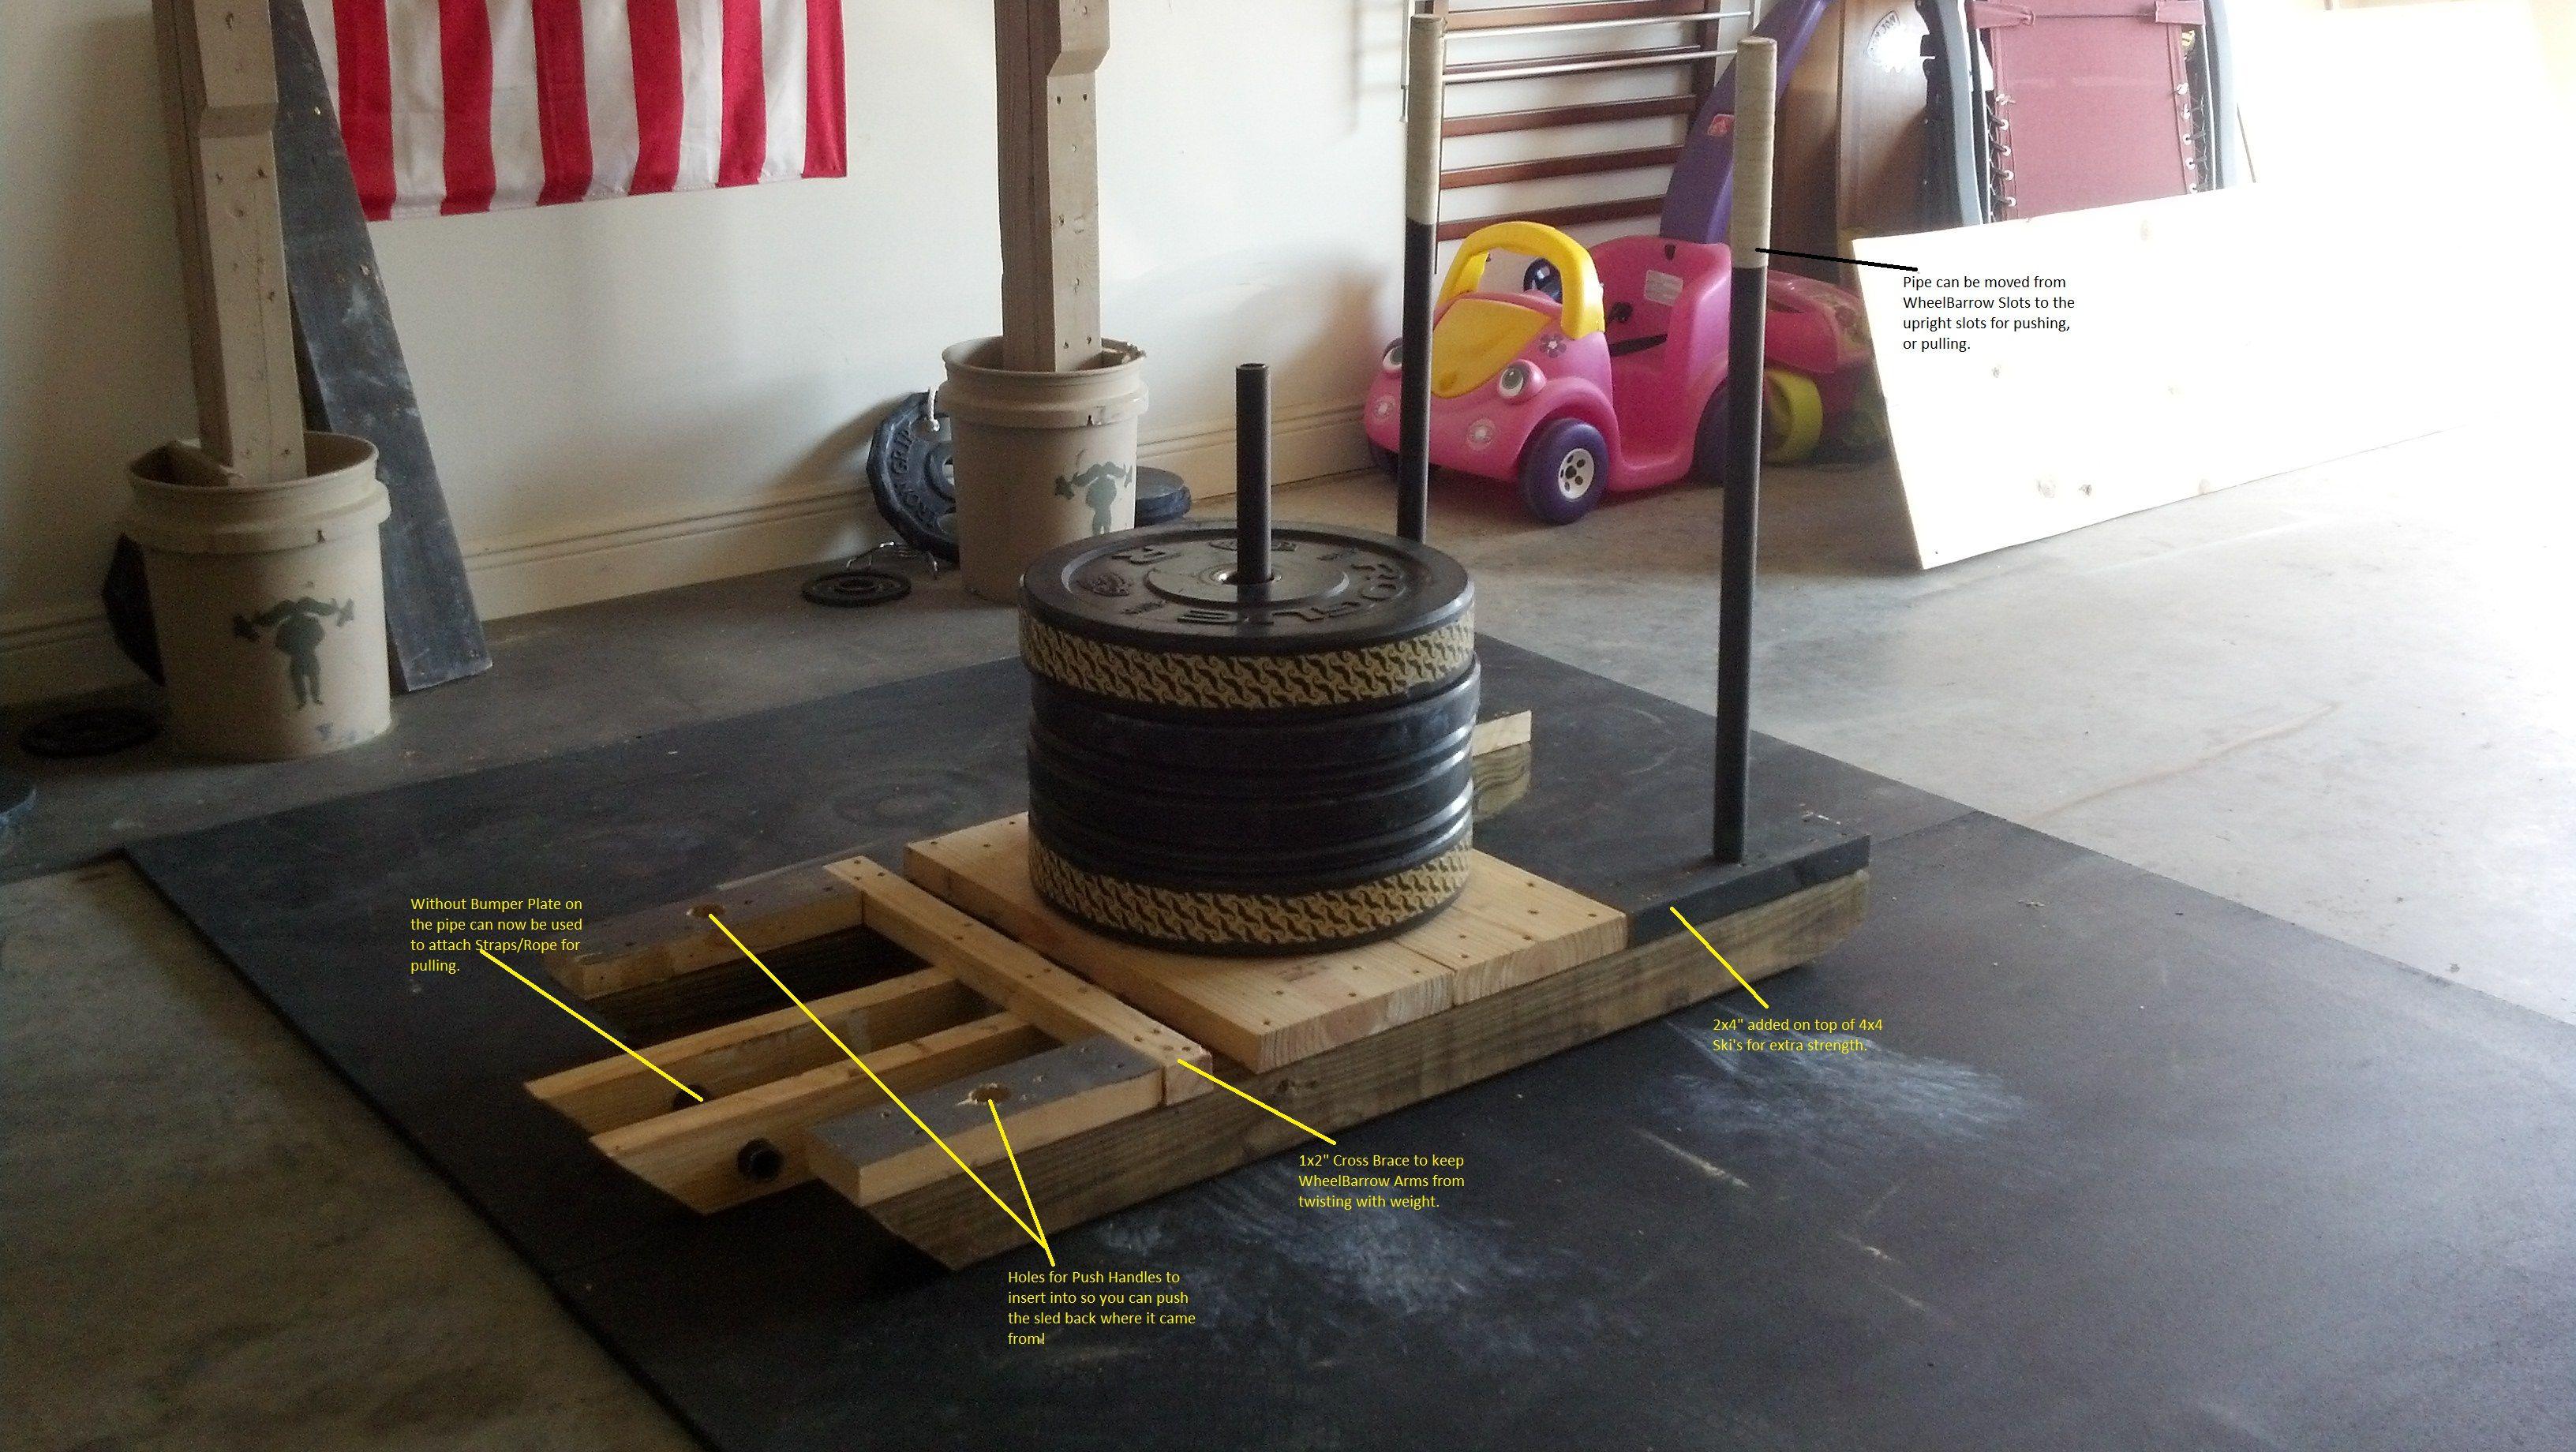 Diy Wheelbarrow And Sled 2 In 1 Wheelbarrow Diy Gym At Home Gym